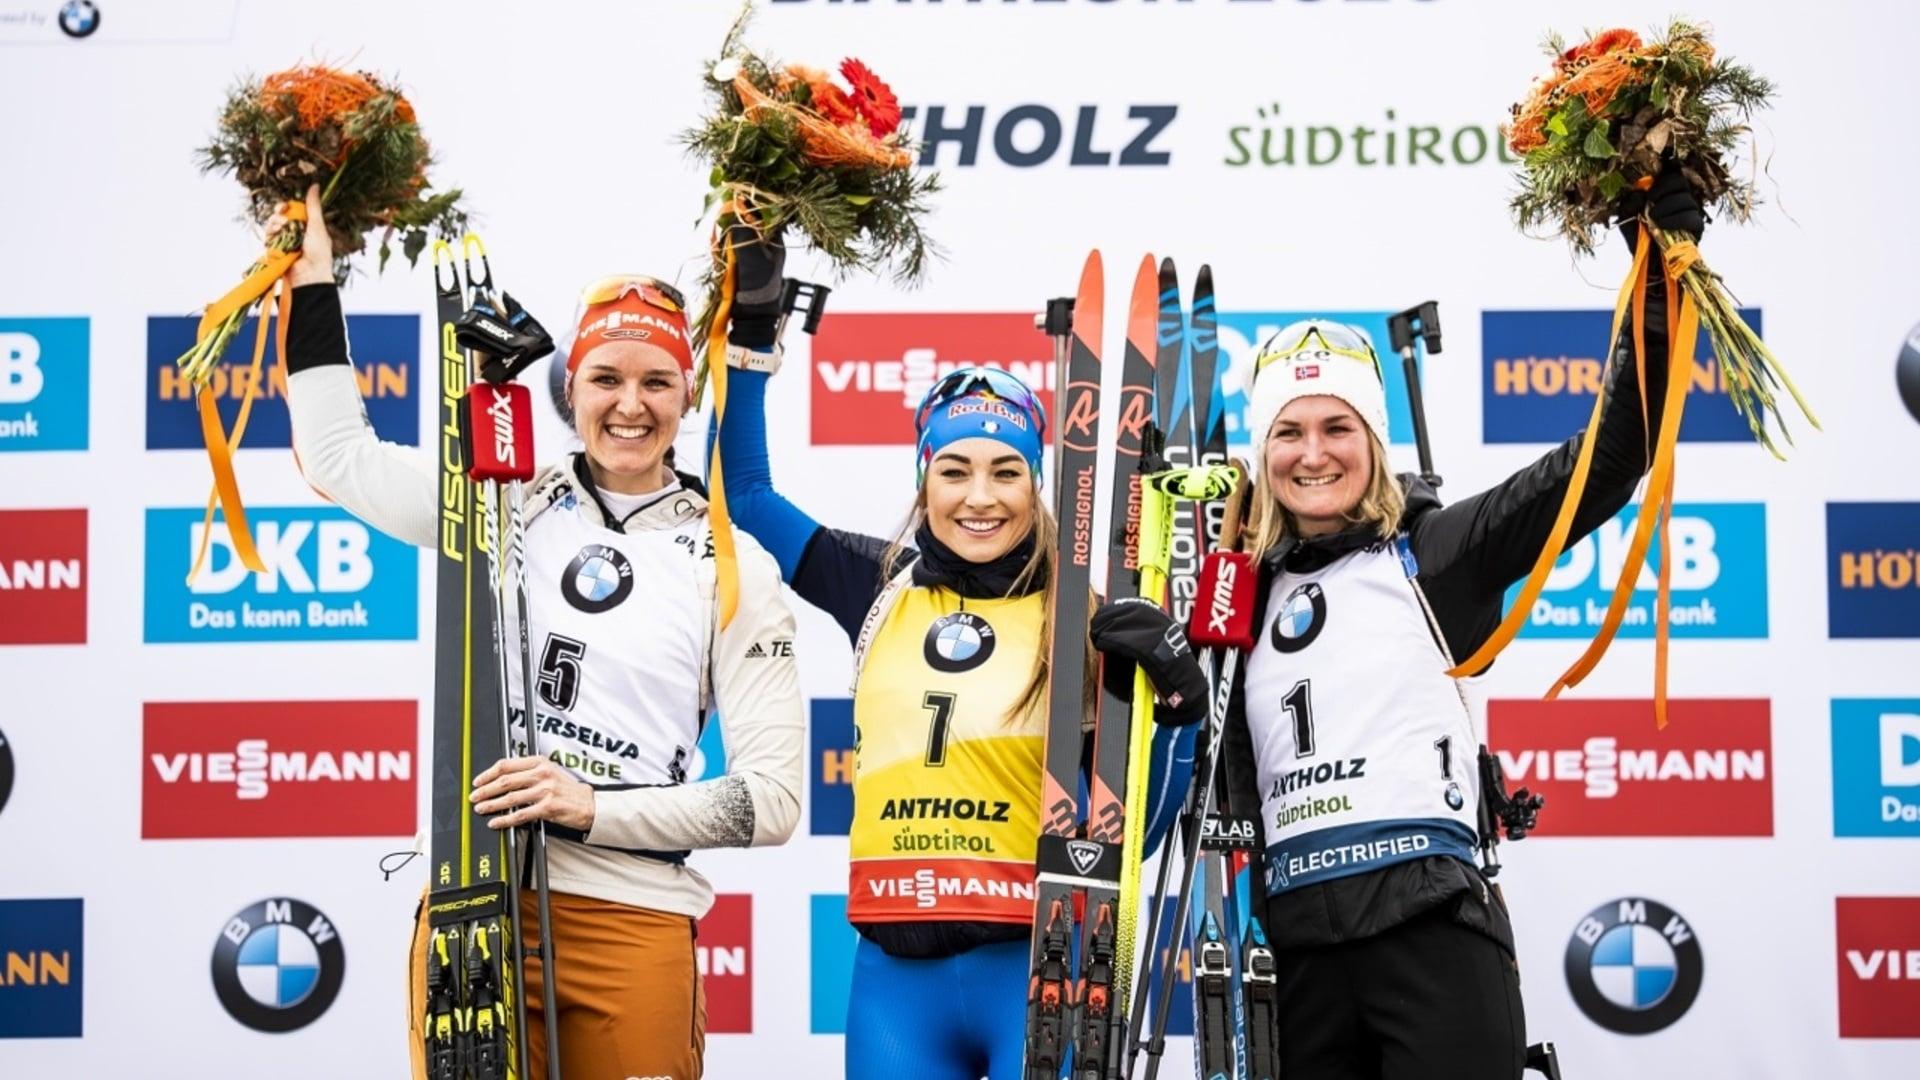 16.02.2020 - Dorothea Wierer fulfills her Golden dream